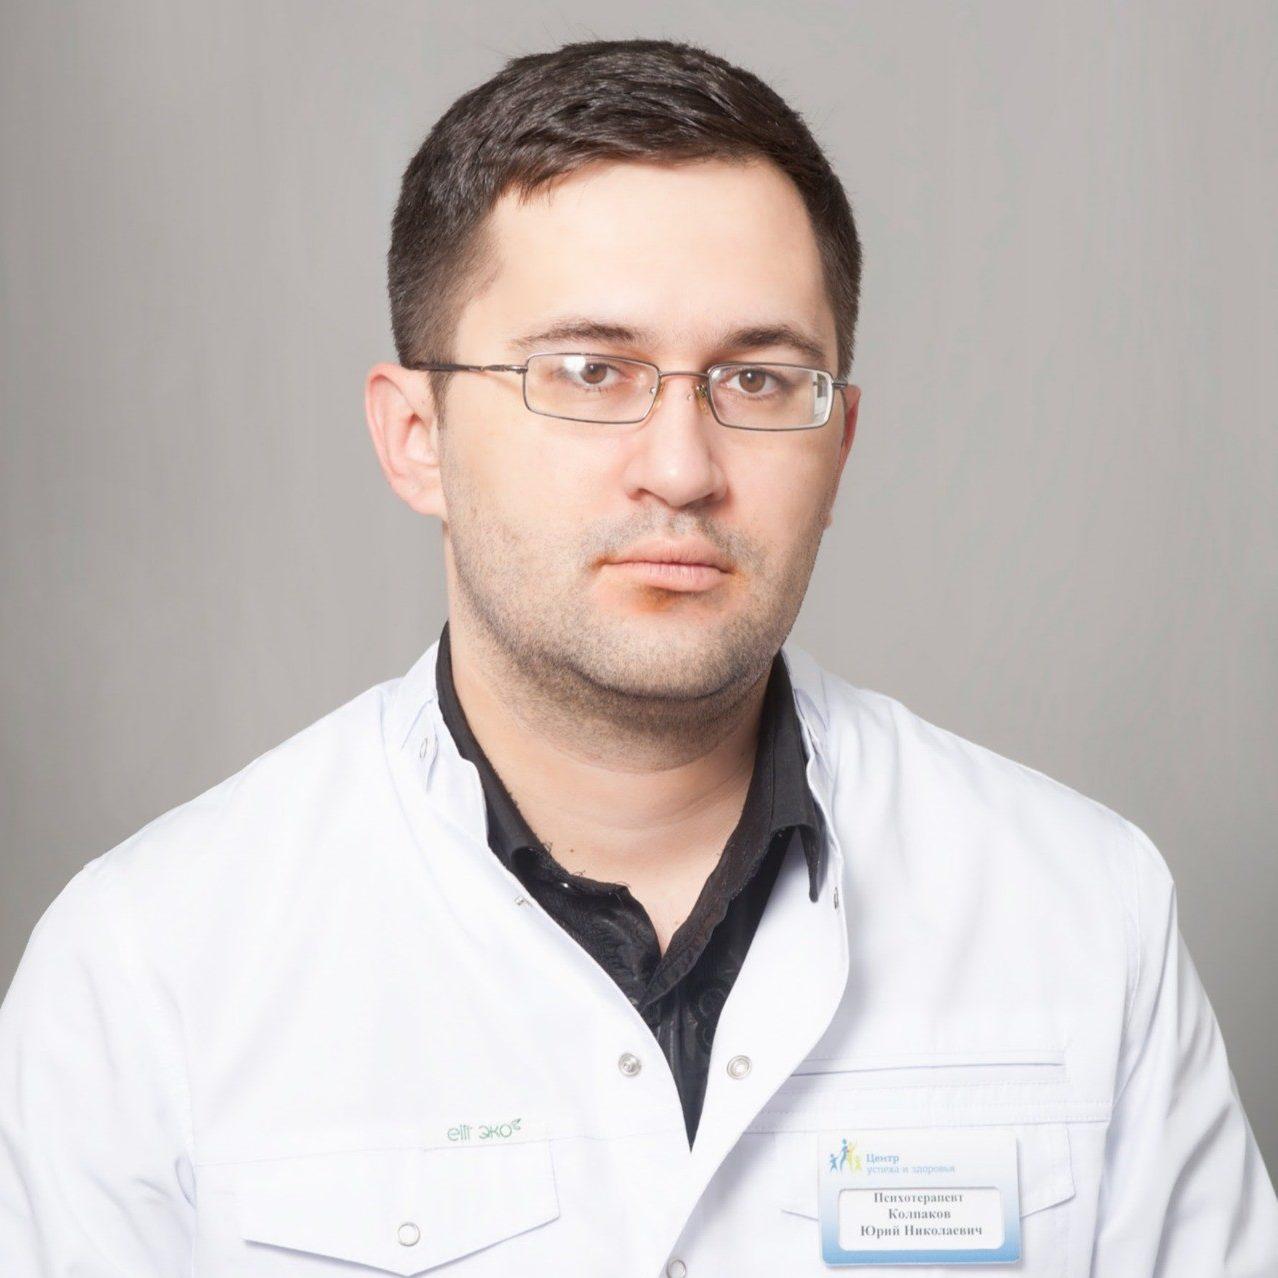 Колпаков Юрий Николаевич